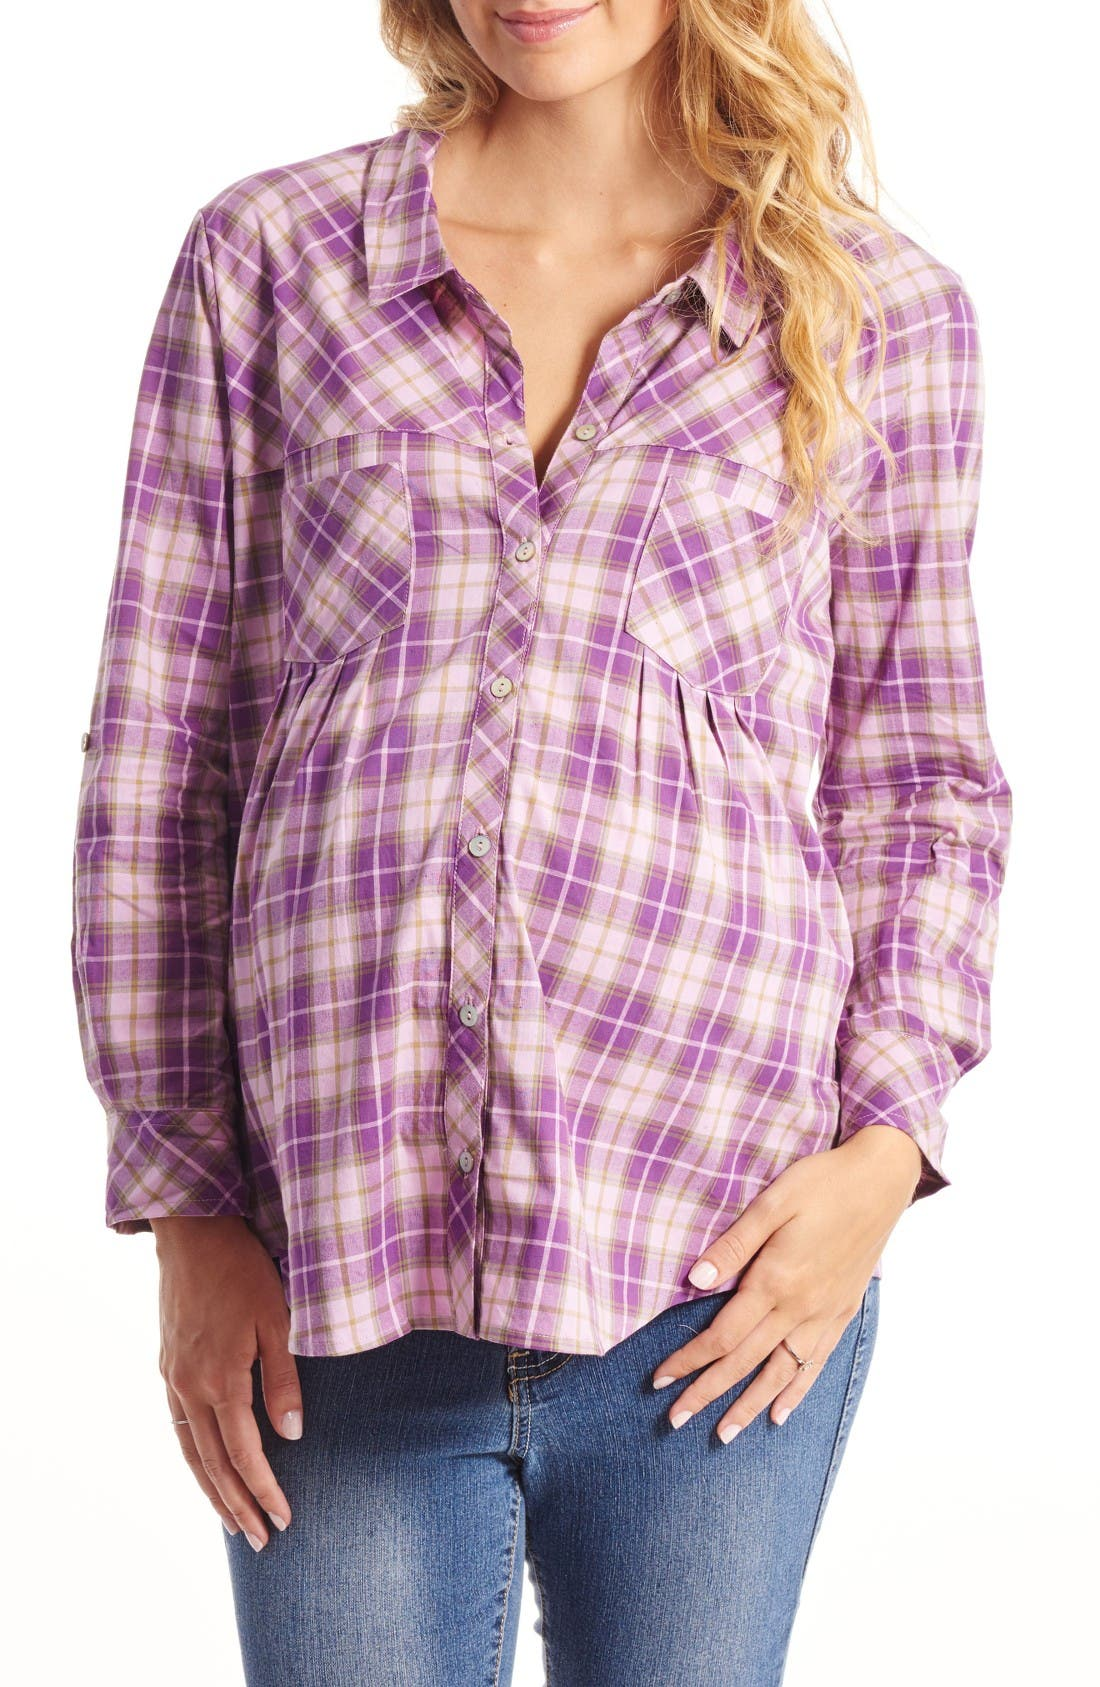 Main Image - Everly Grey 'Batina' Maternity Shirt